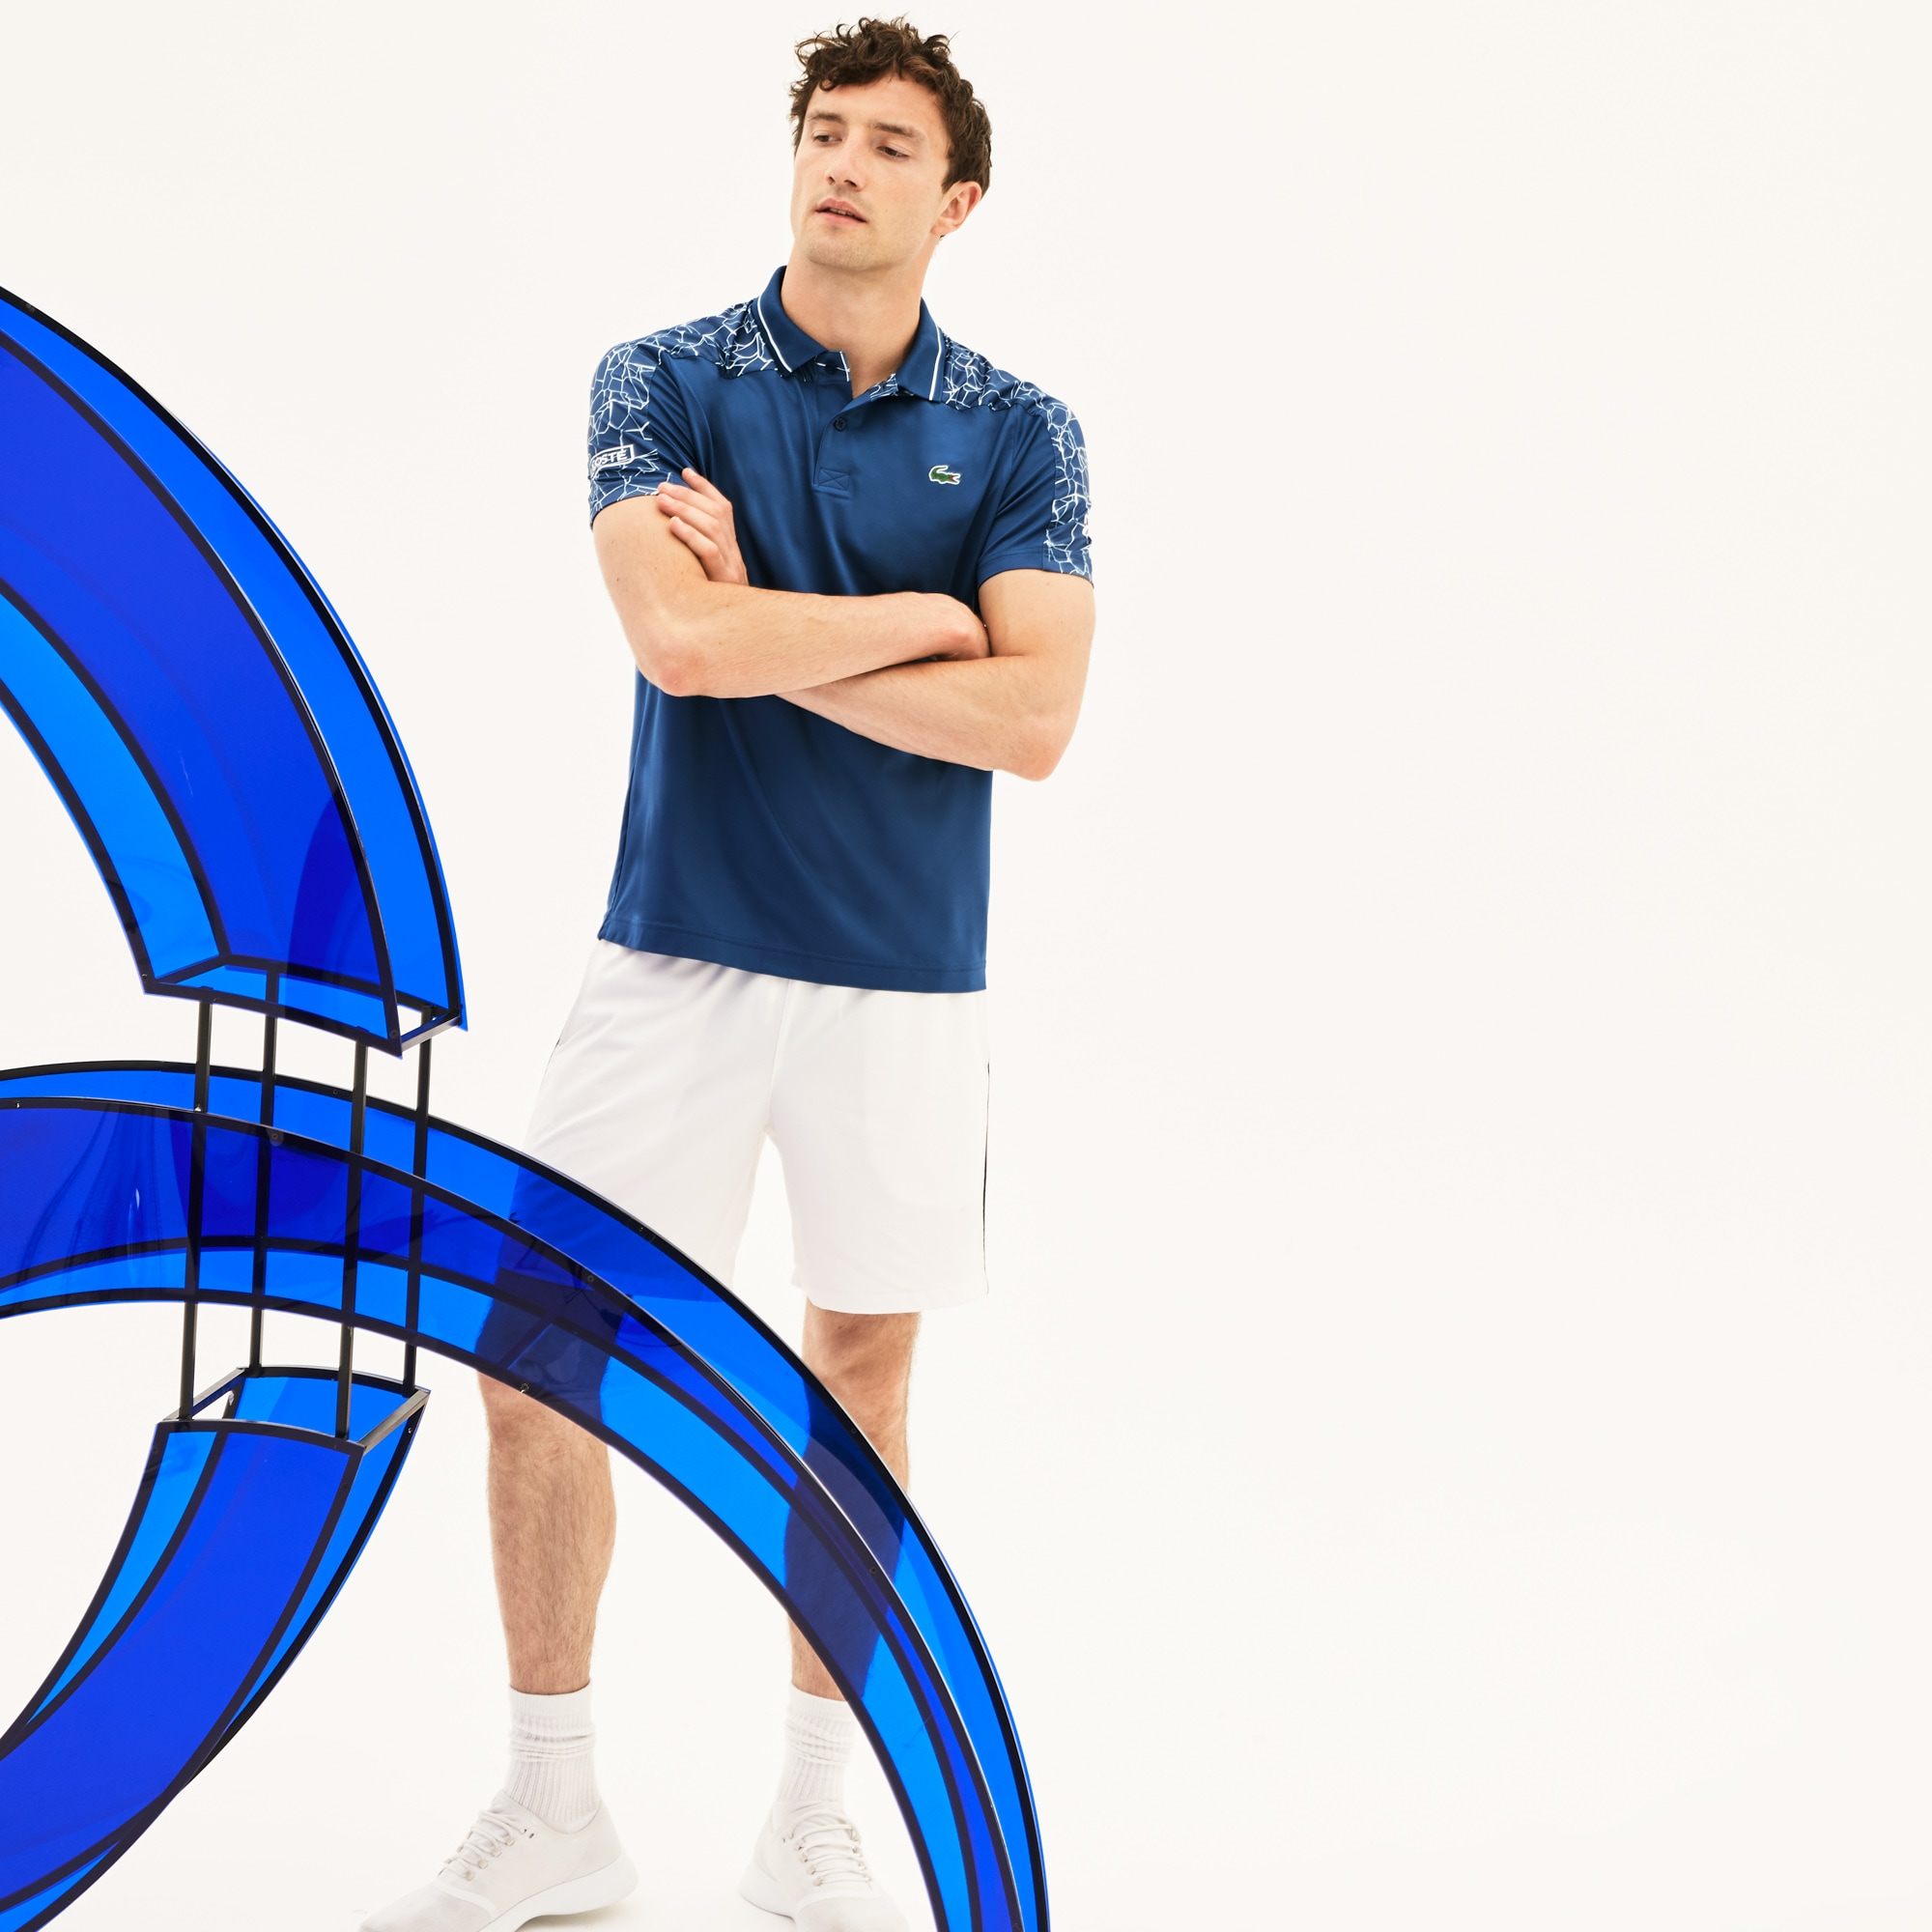 Lacoste - Herren-Poloshirt aus Stretch-Jersey LACOSTE SPORT NOVAK DJOKOVIC - 4